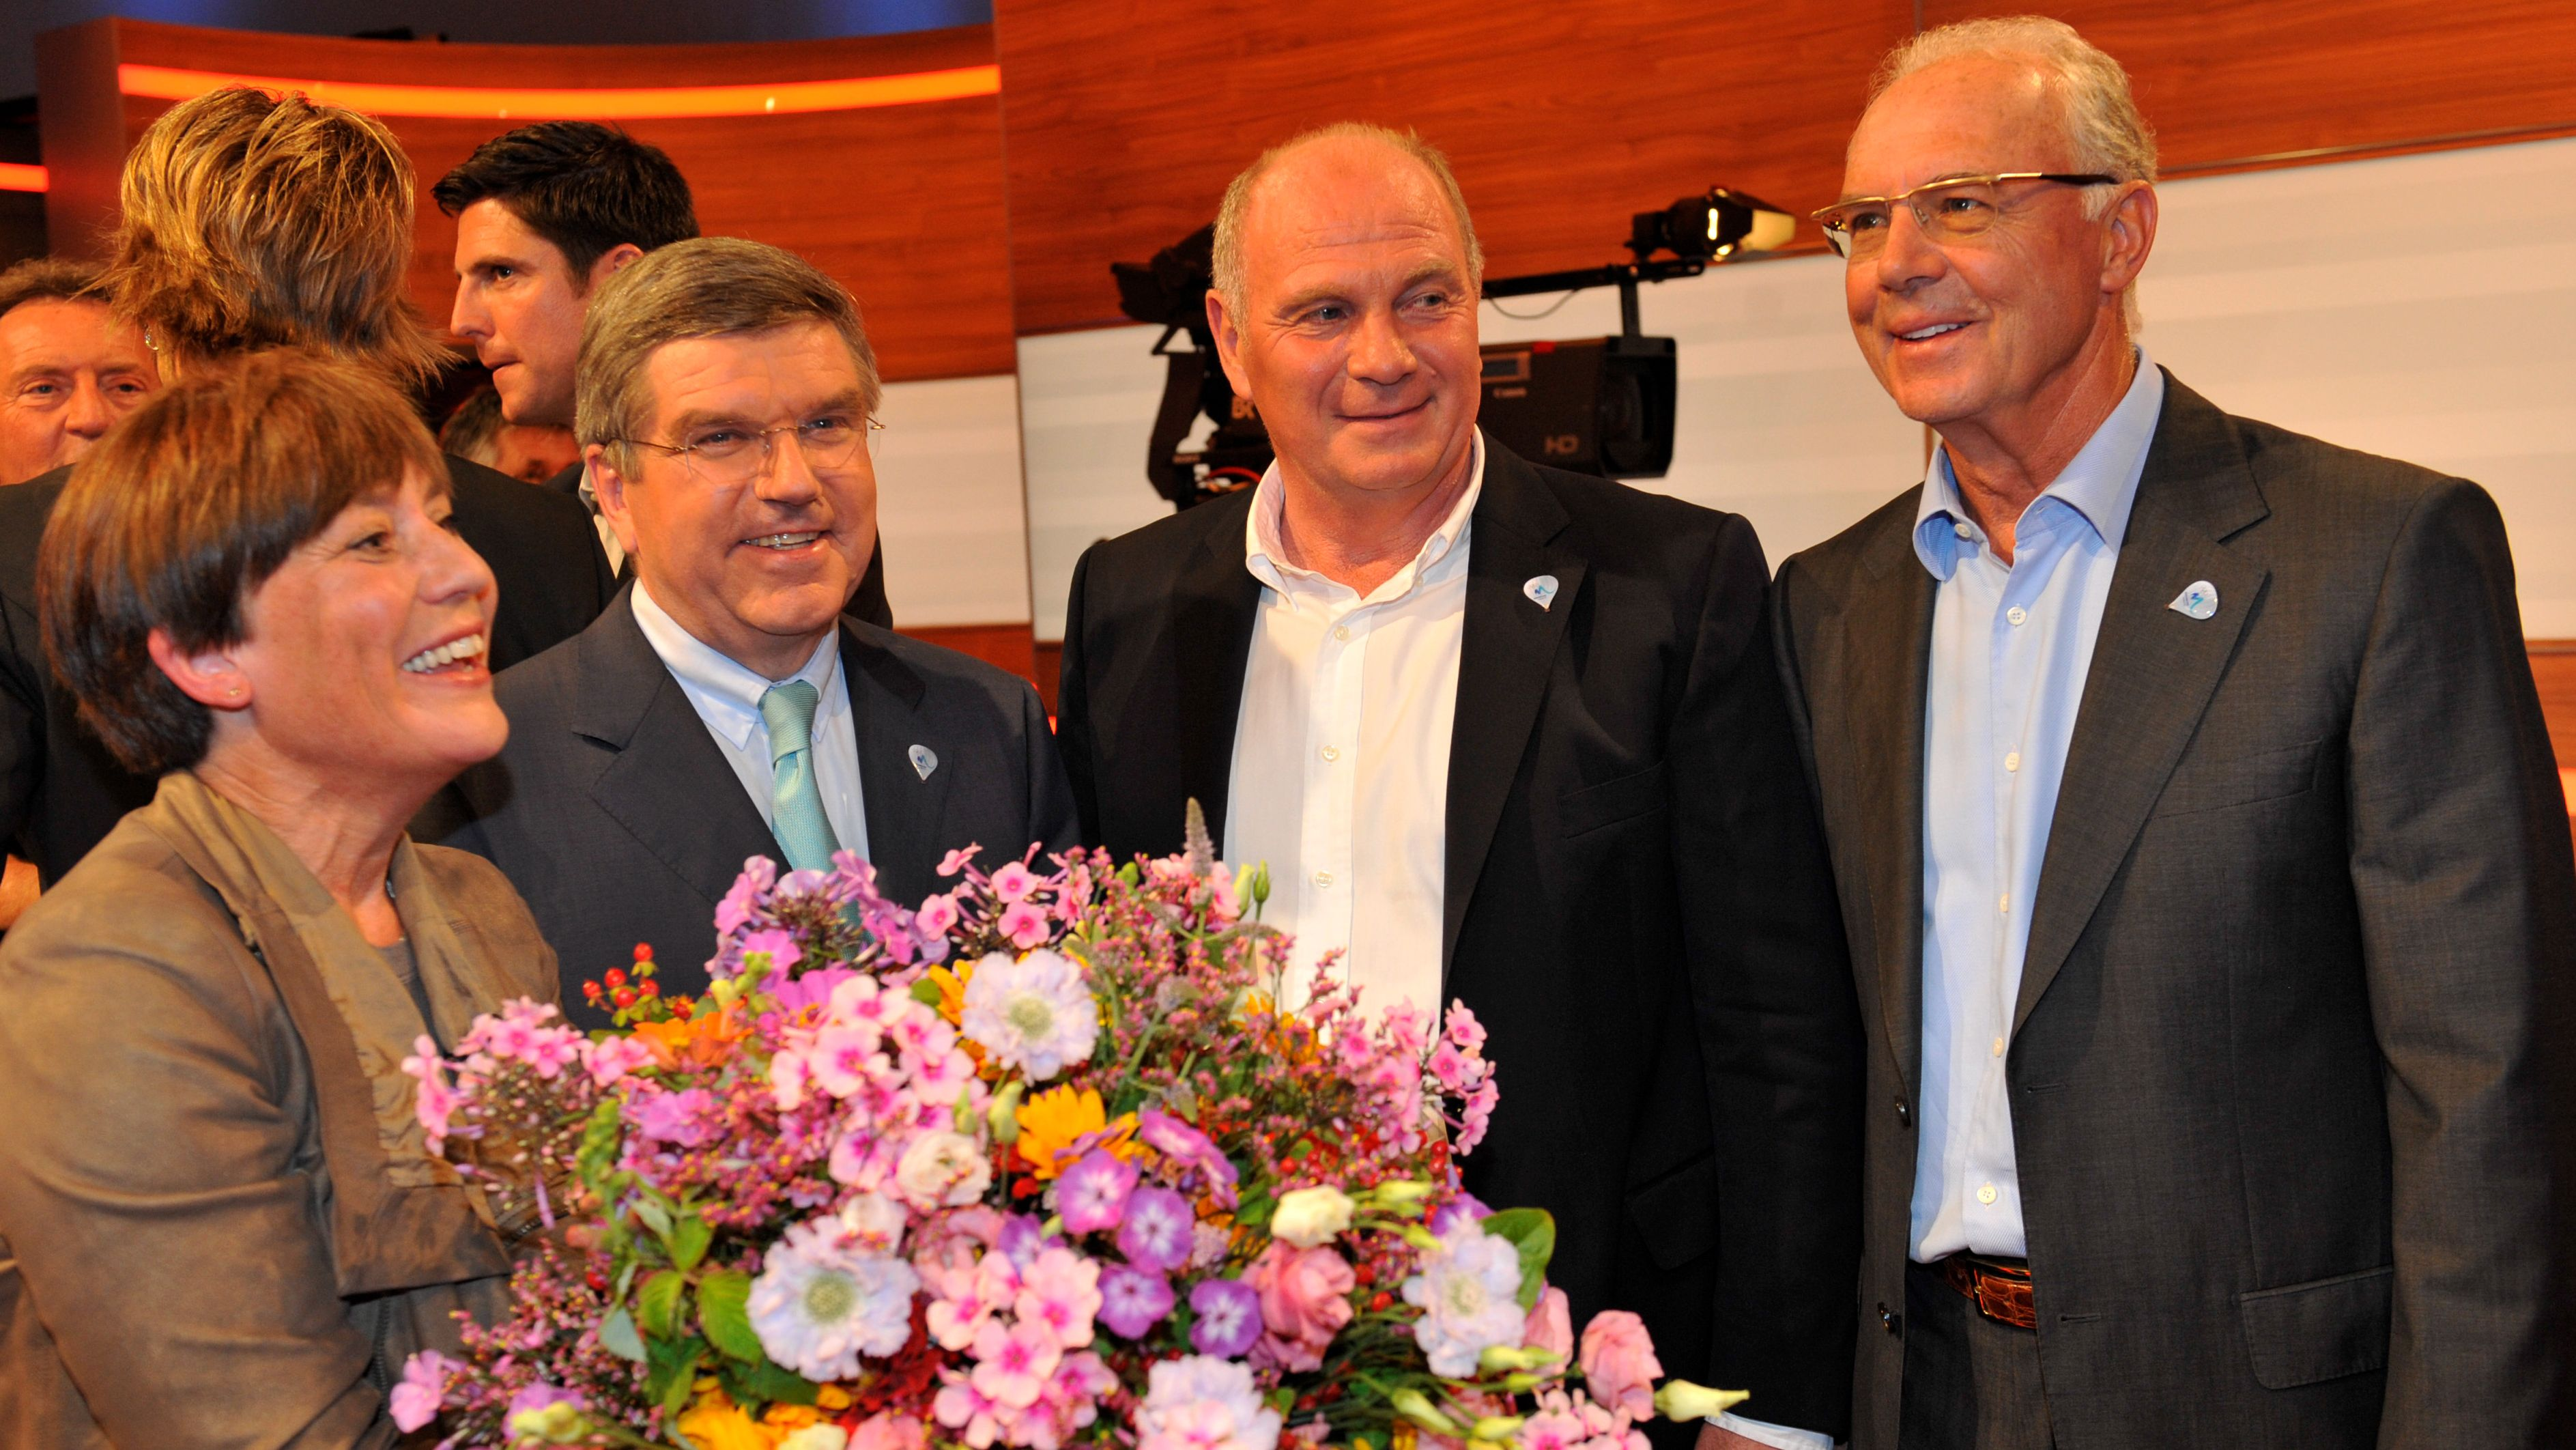 Rosi Mittermaier, Thomas Bach, Uli Hoeneß, Franz Beckenbauer (v.l.) bei der Geburtstagsgala 2010